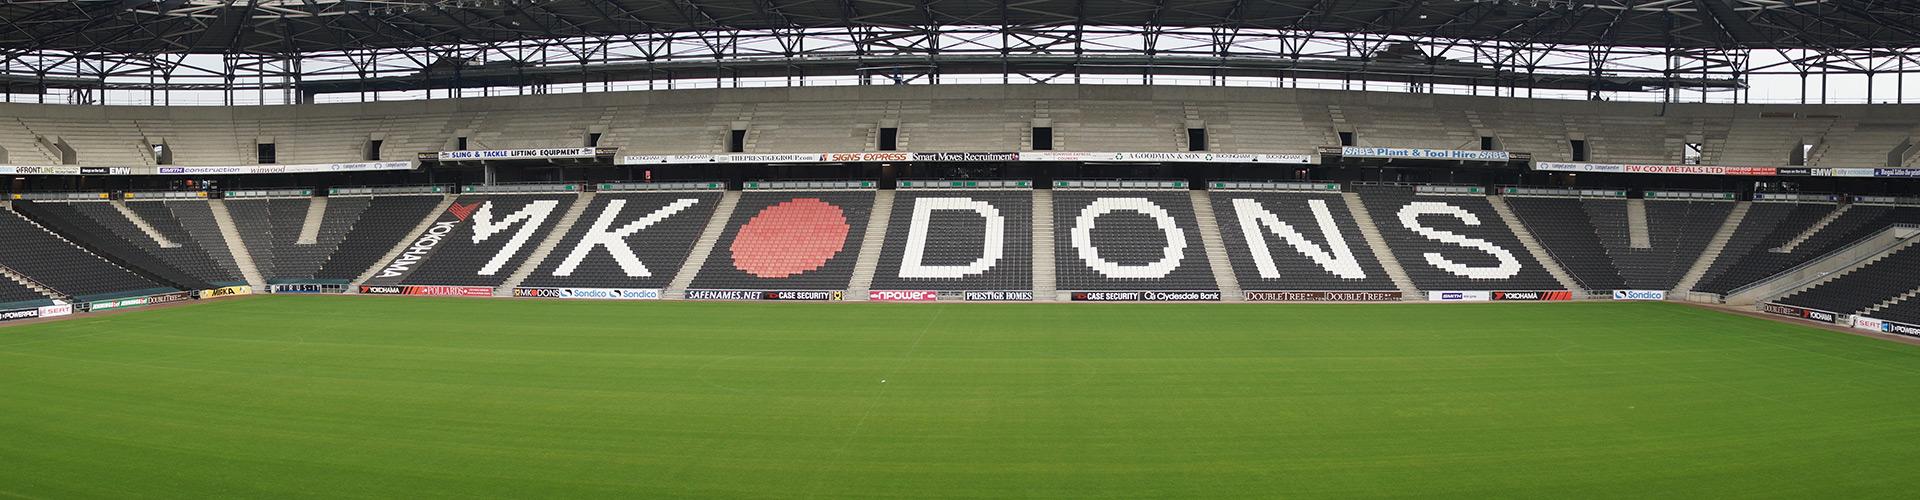 MK Dons stadium